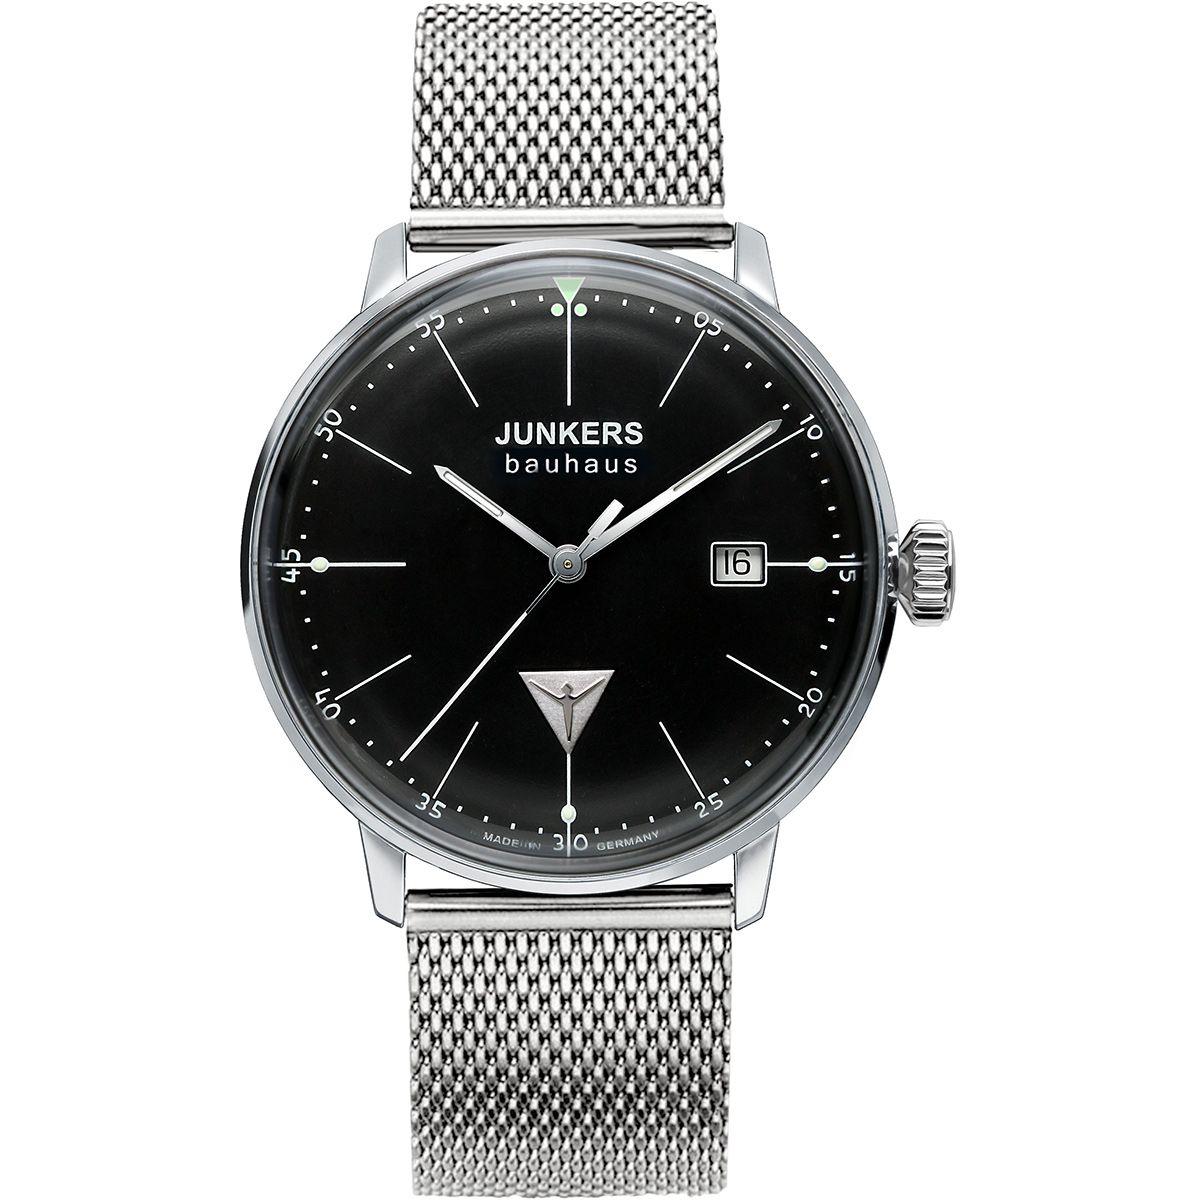 Junkers 6071M2 Bauhaus Lady Armbanduhr, Uhren herren